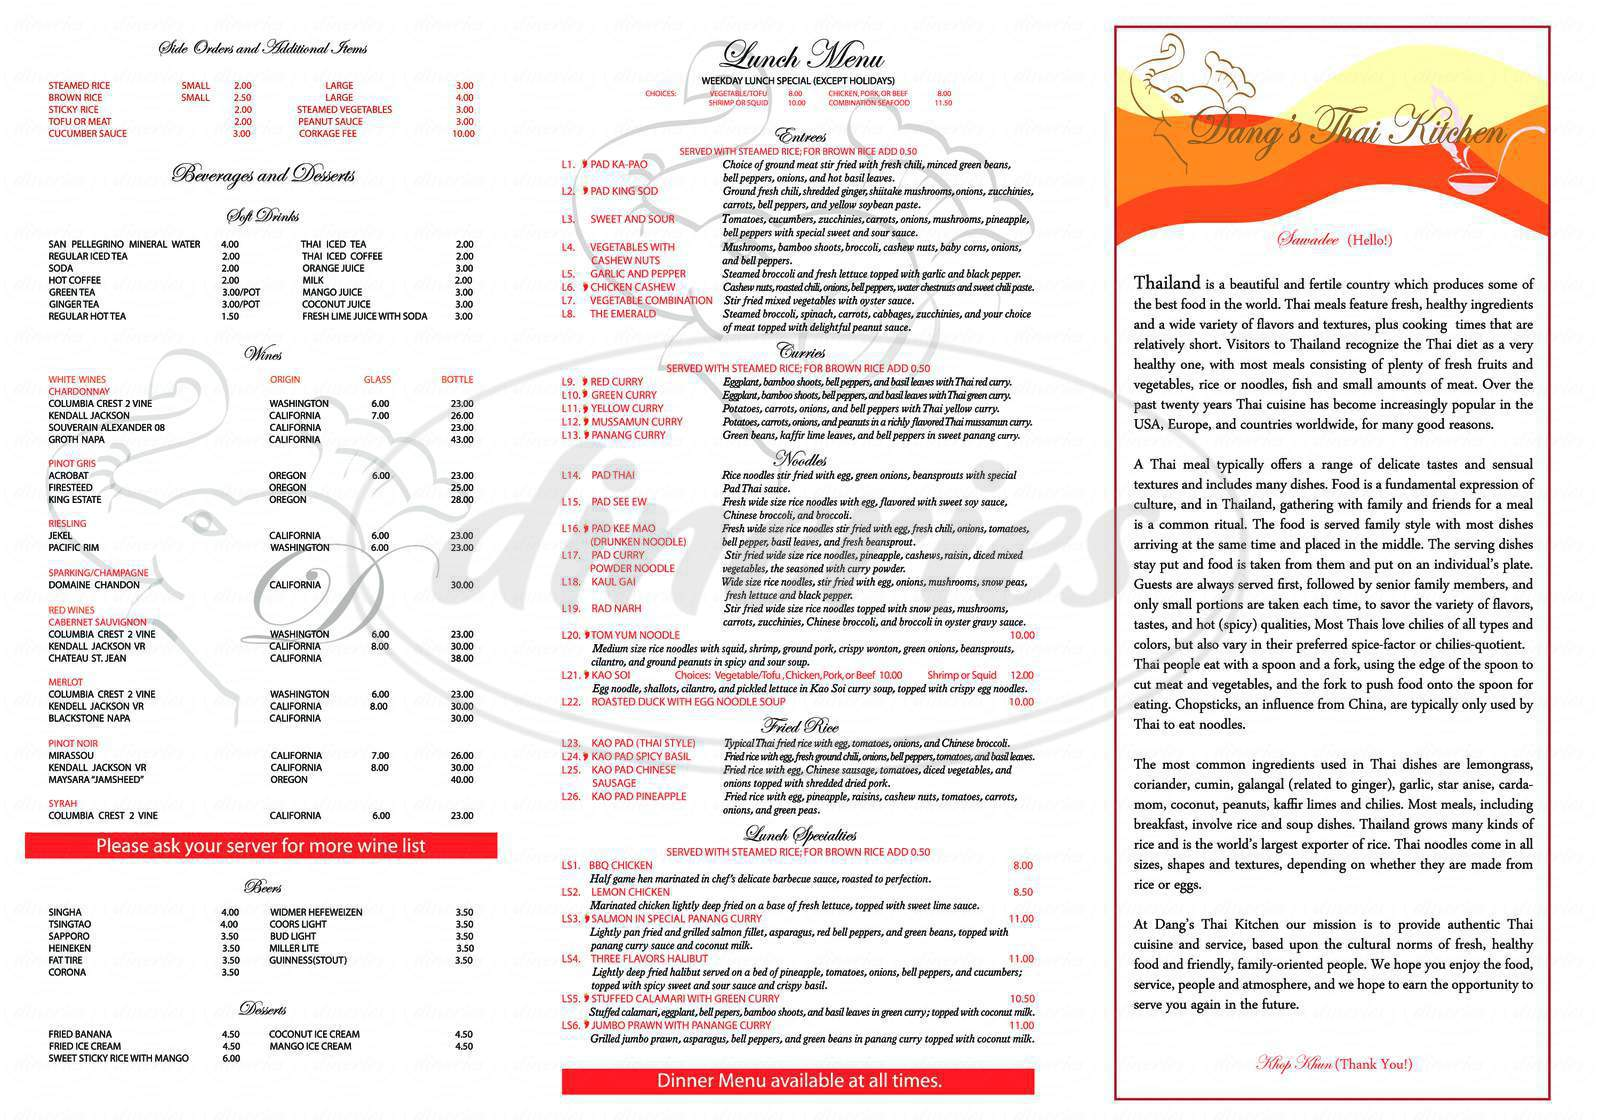 menu for Dang's Thai Kitchen